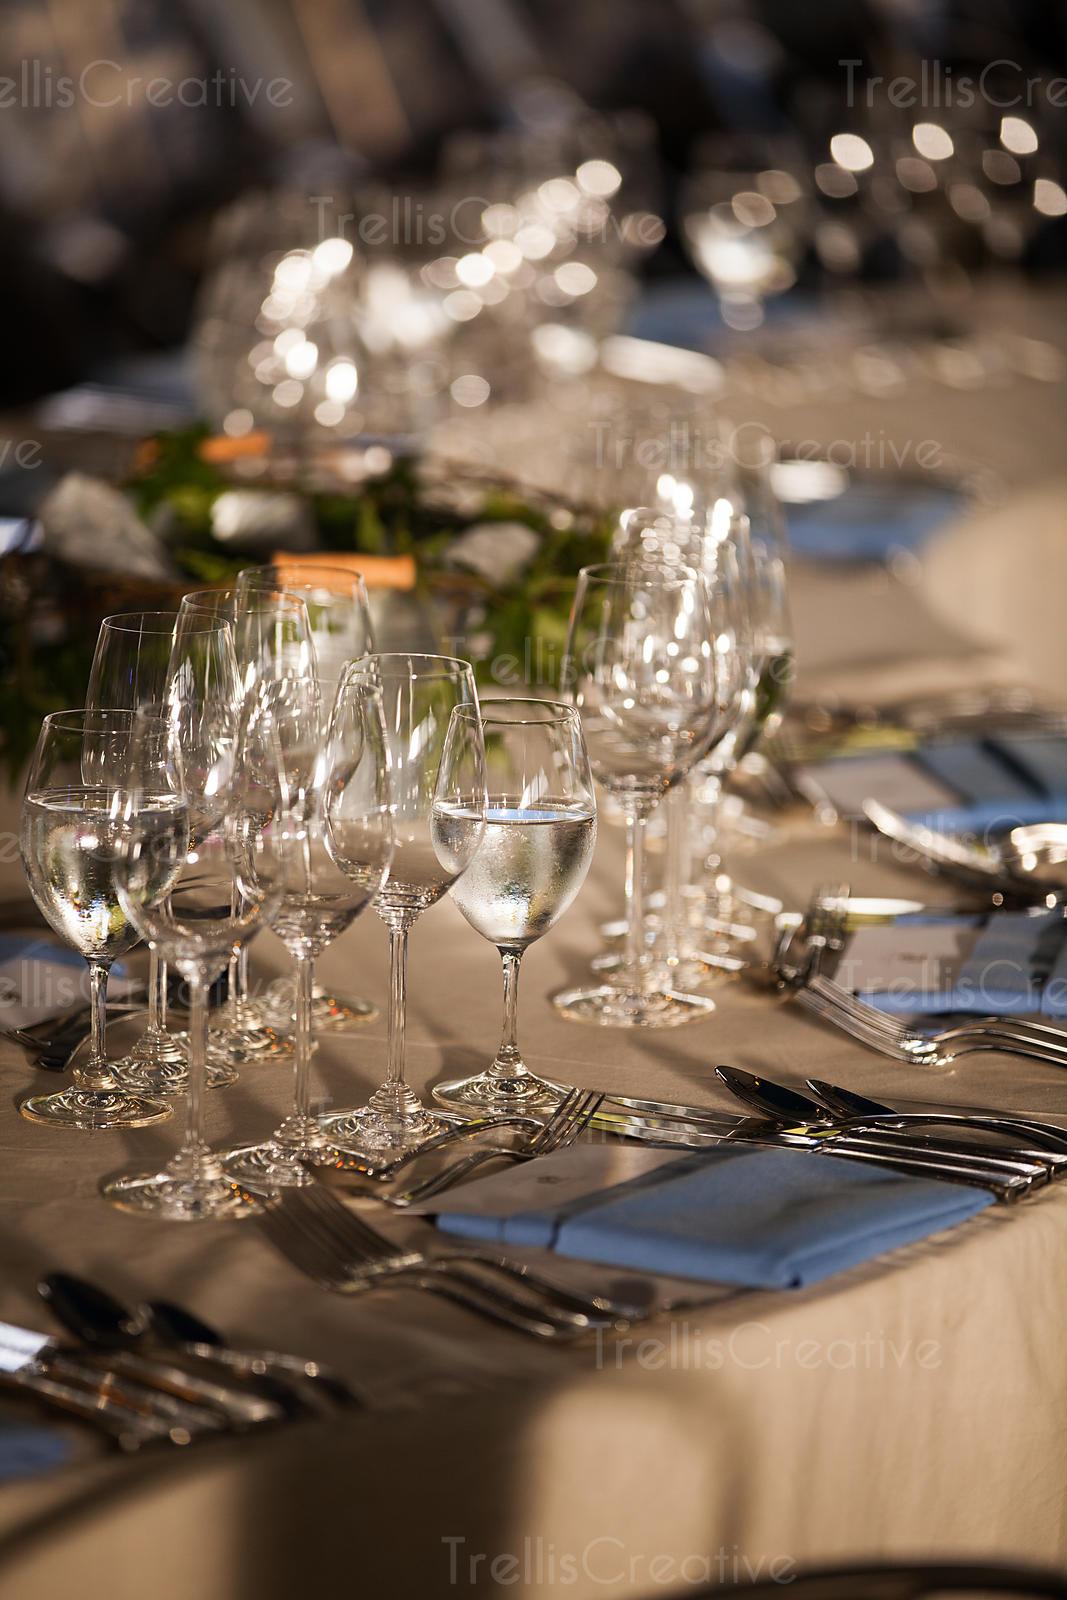 Image Elegant Table Setting At A Fancy Restaurant High Res Stock Photo Trelliscreative Com